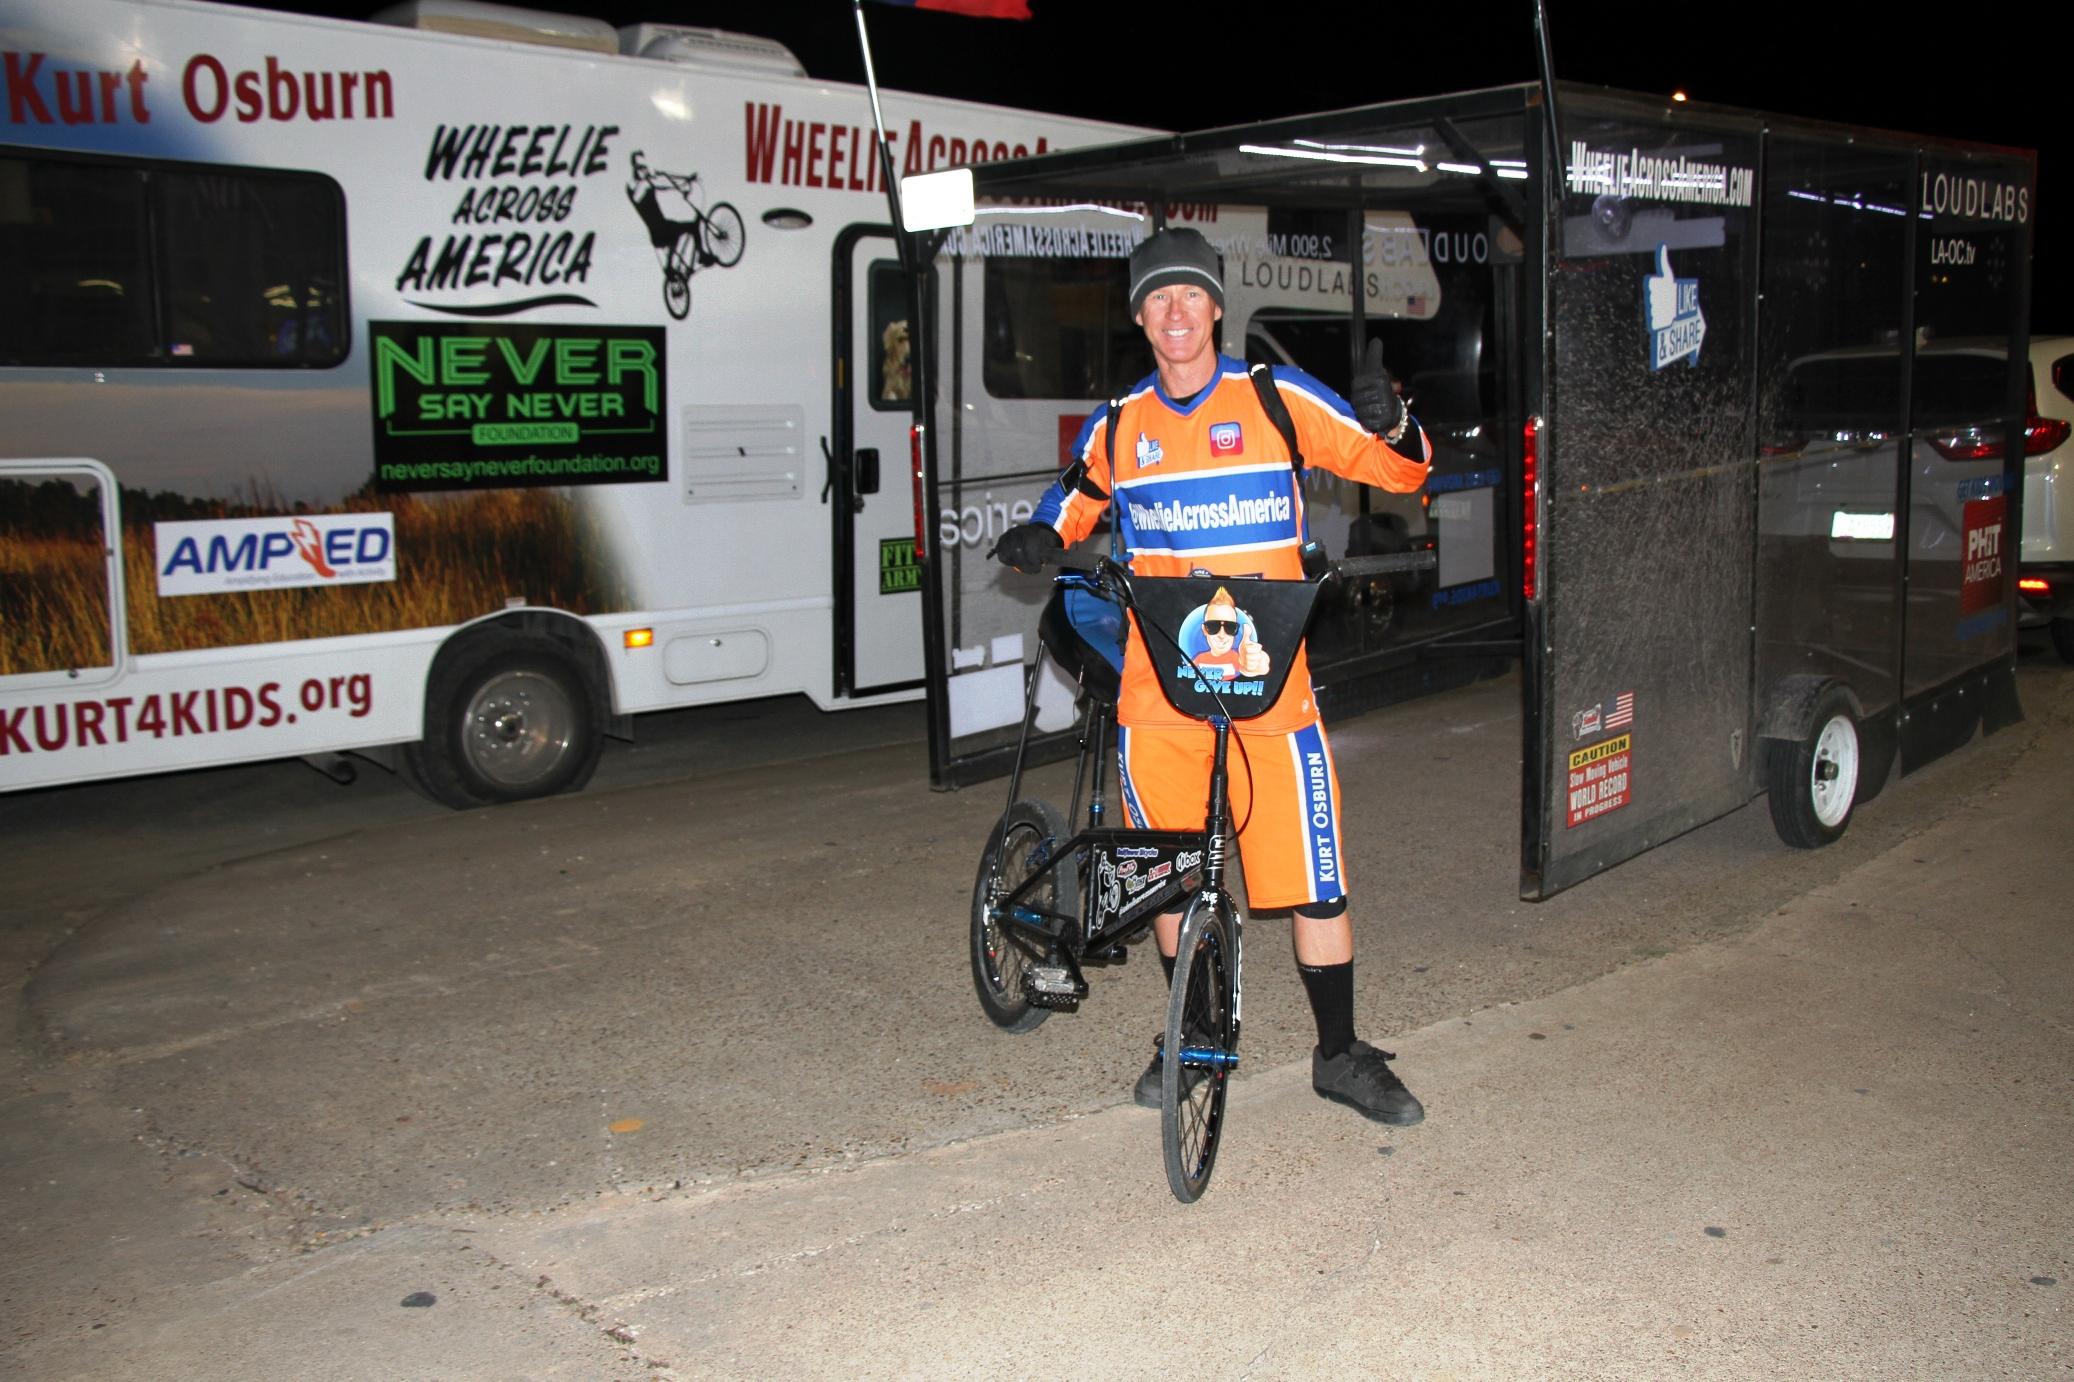 Guinness World Record Holder Wheelies His Way Through Liberty County